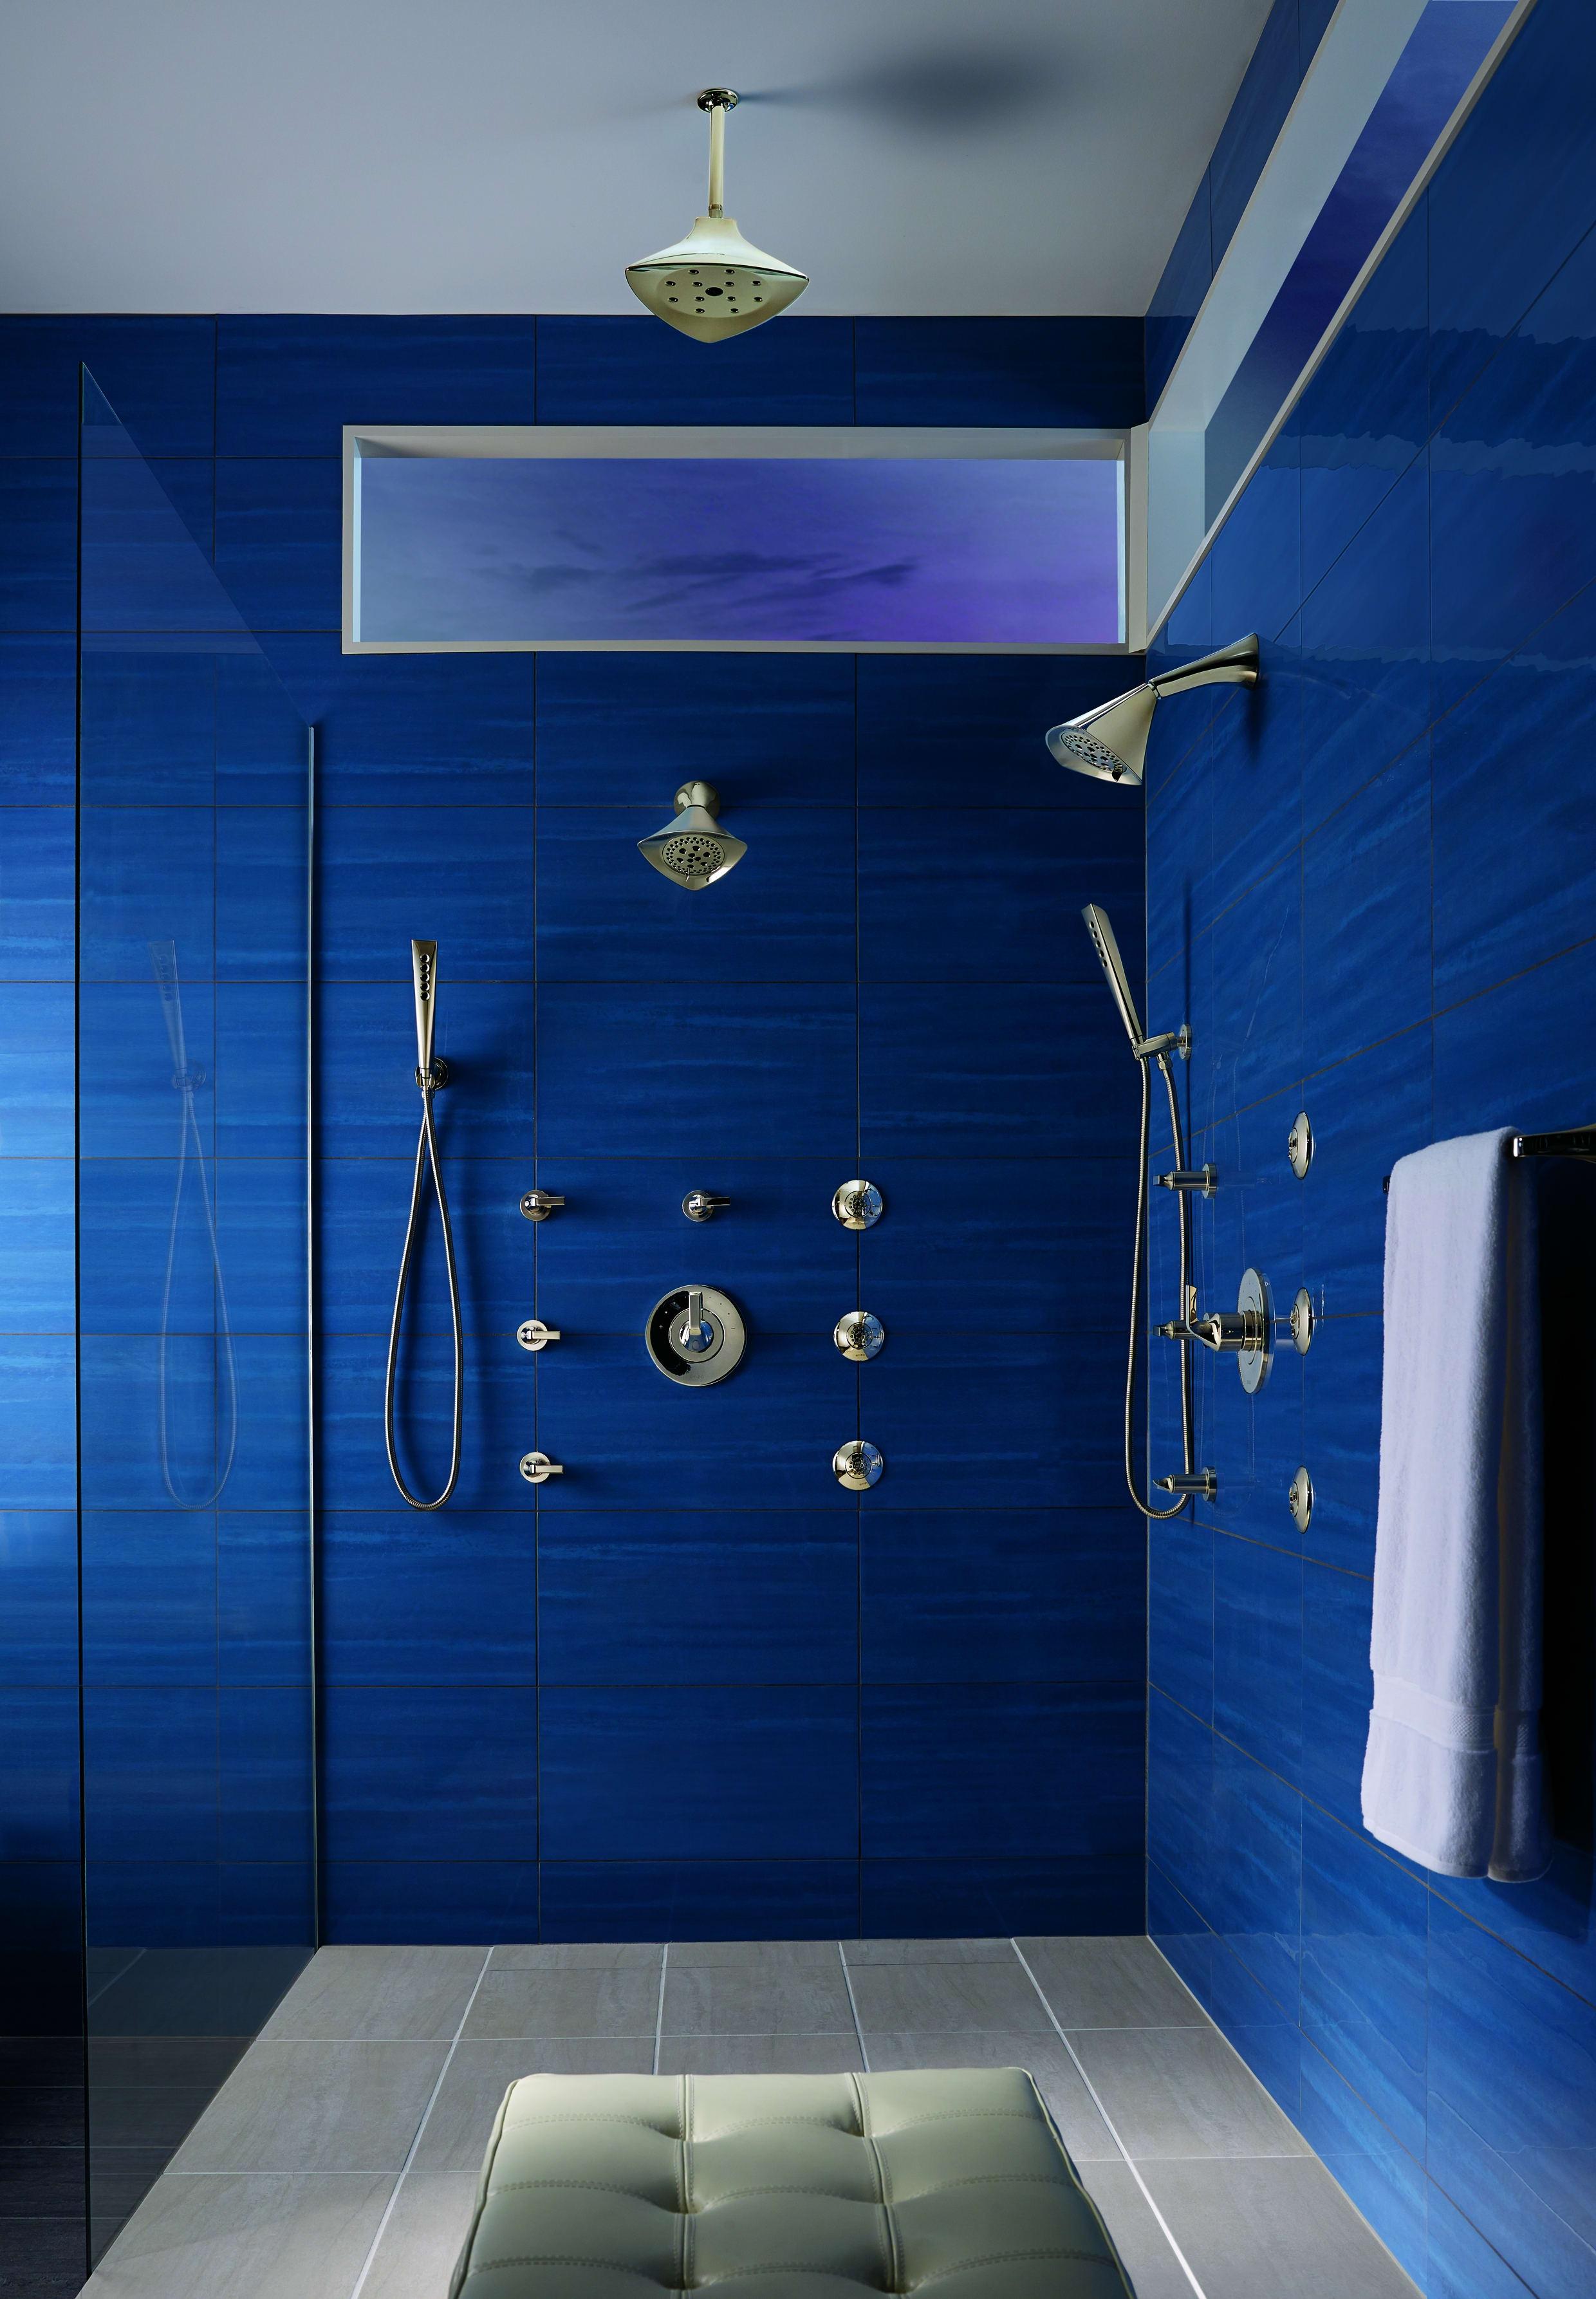 Brizo 88850-PN Brilliance Polished Nickel Sotria Hand Shower Package ...